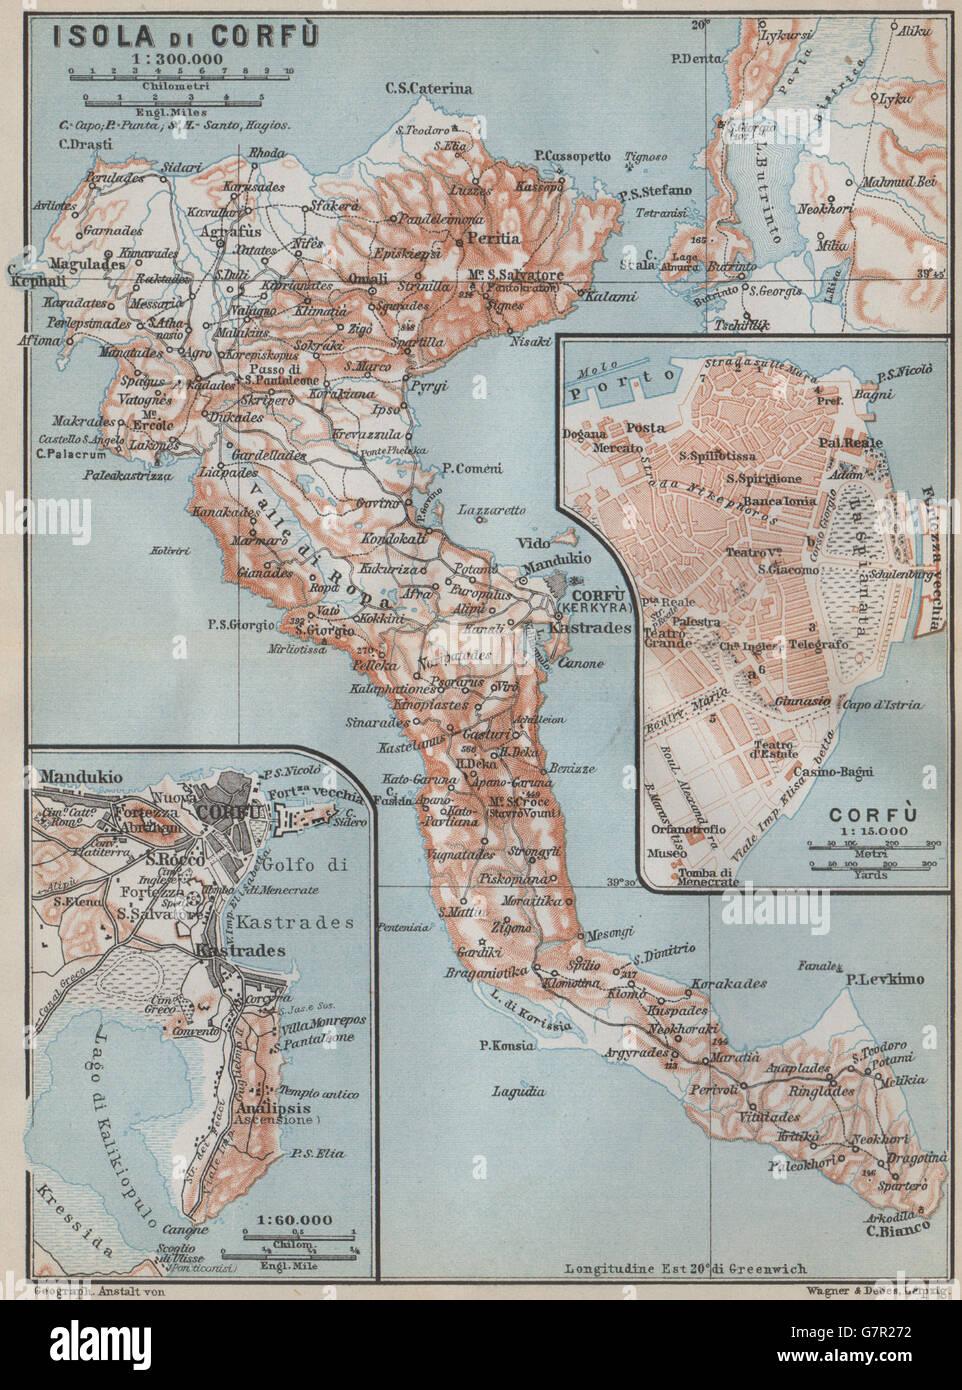 Corfu Island Town Kerkira Town City Plan Sxedio Polhs Greece